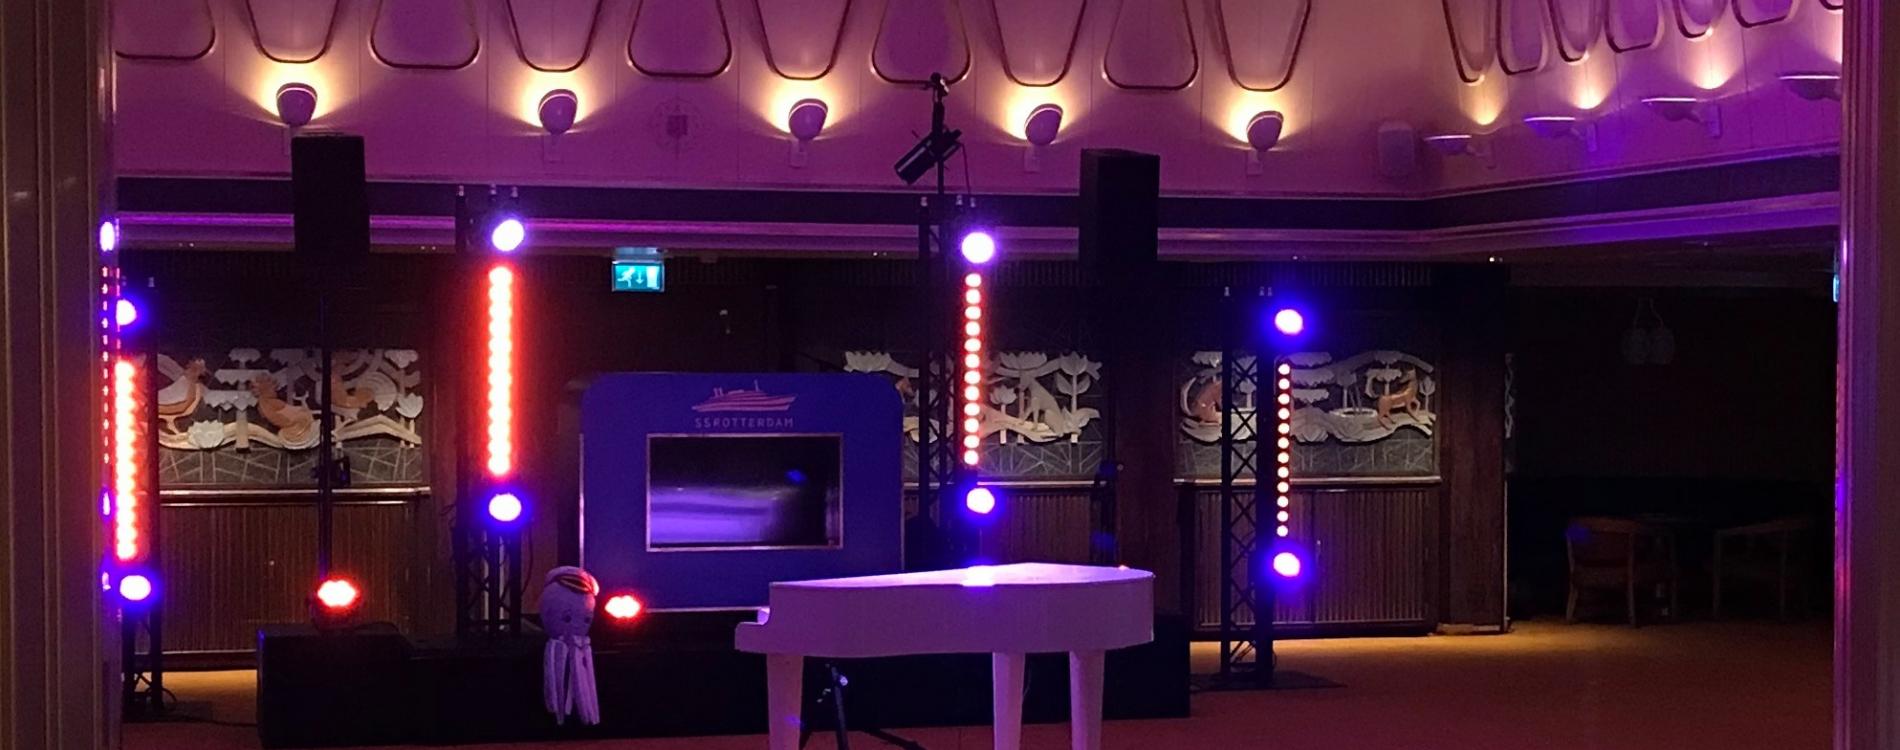 DJ booth en piano setting